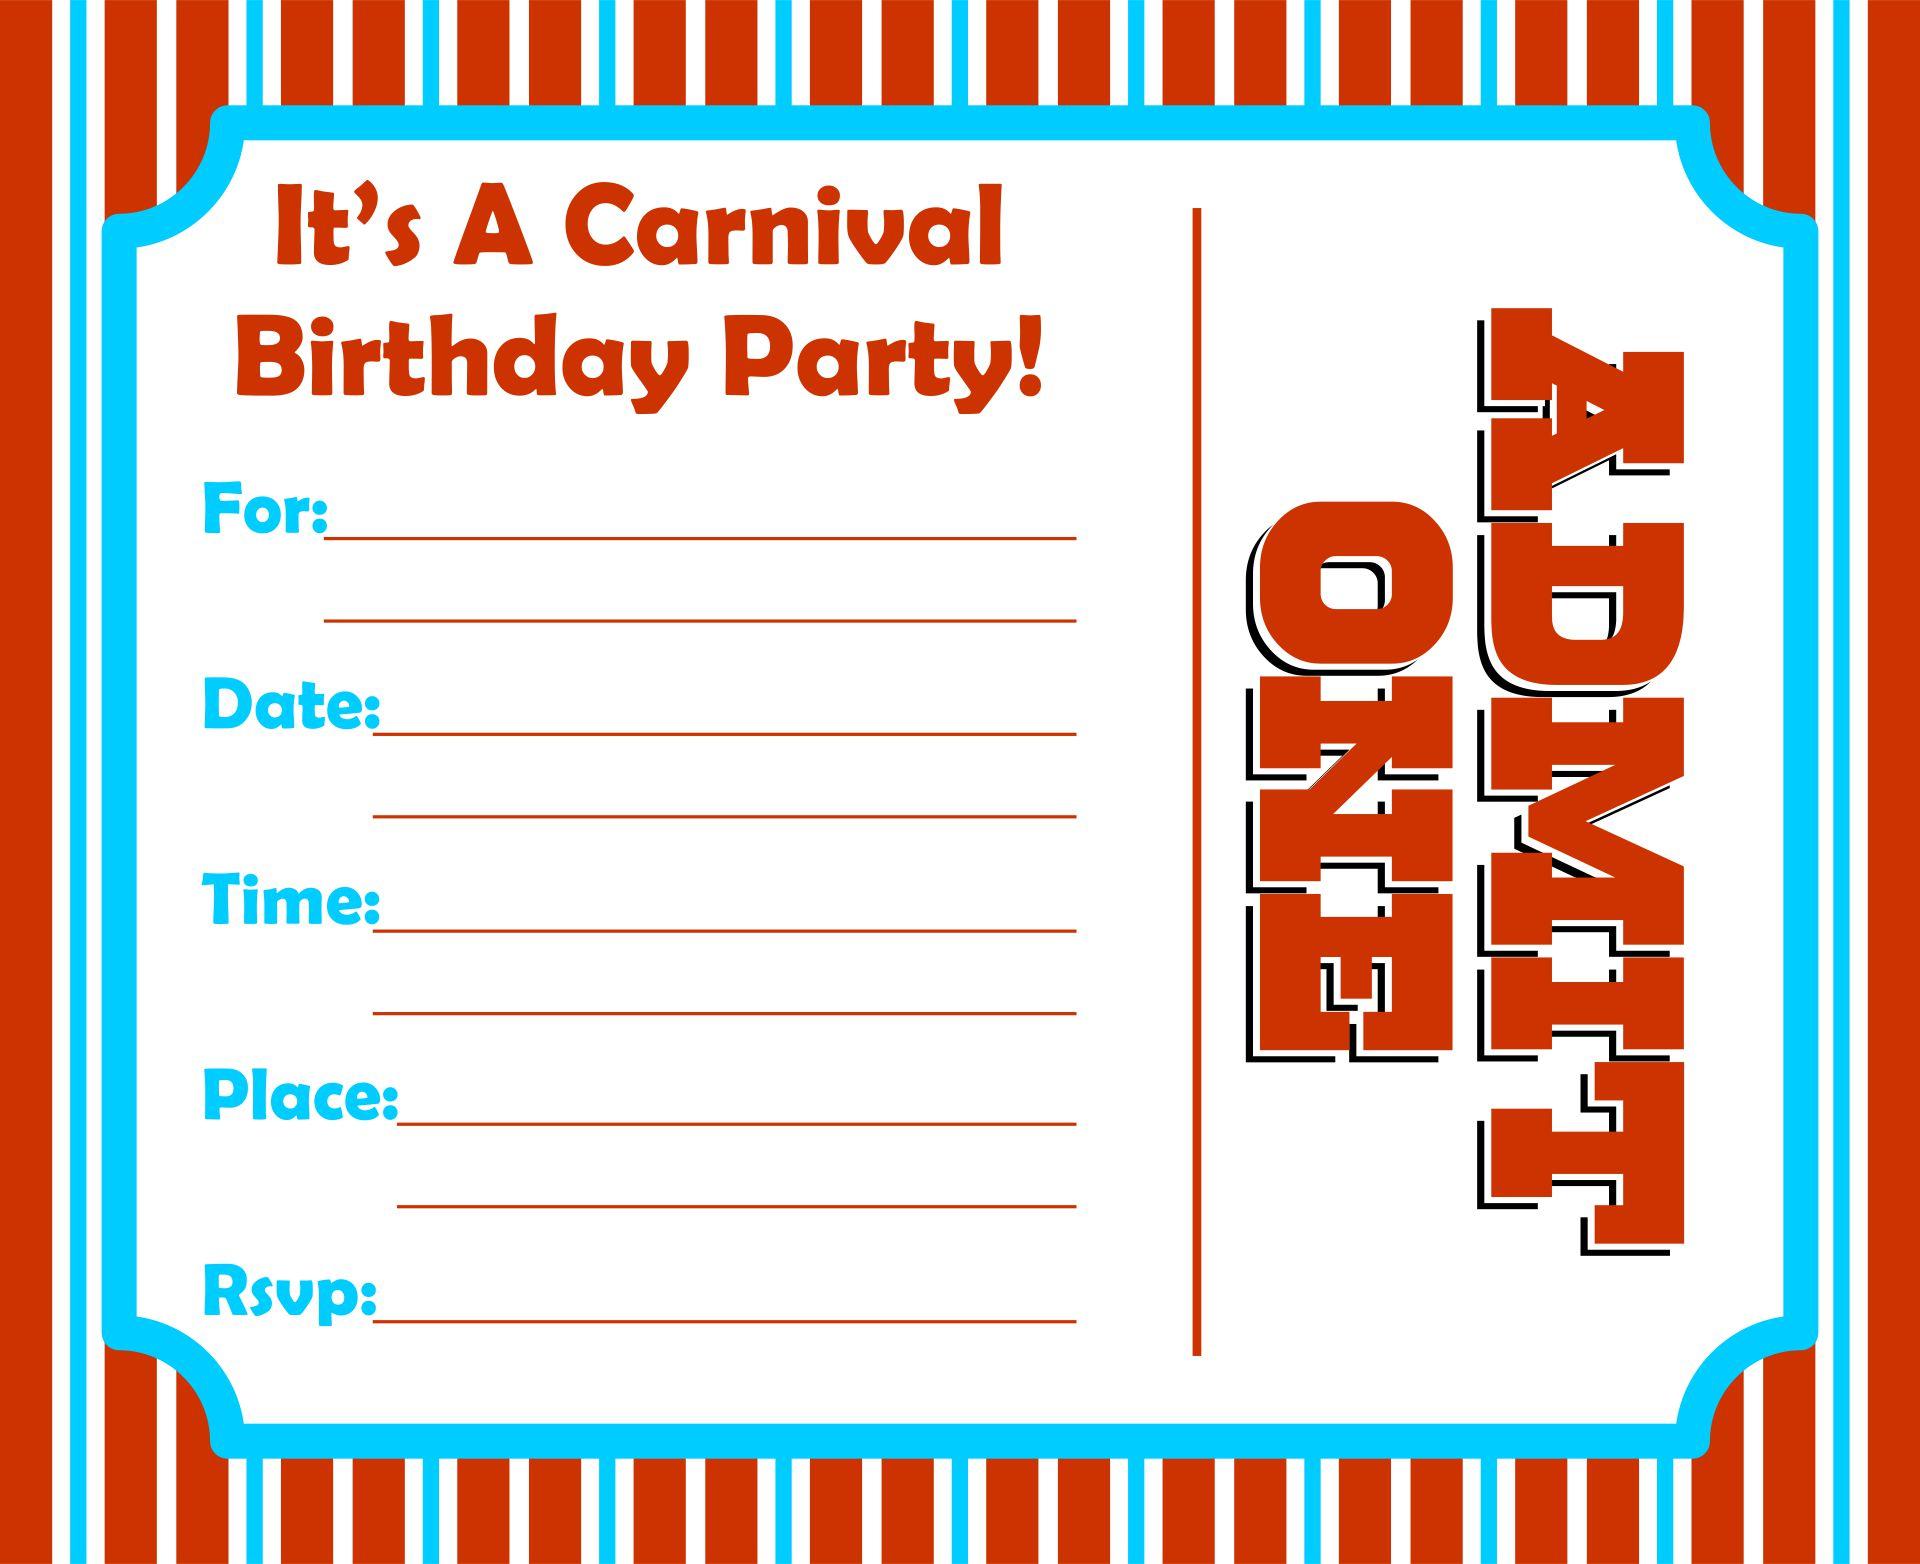 Carnival Ticket Birthday Invitation Template